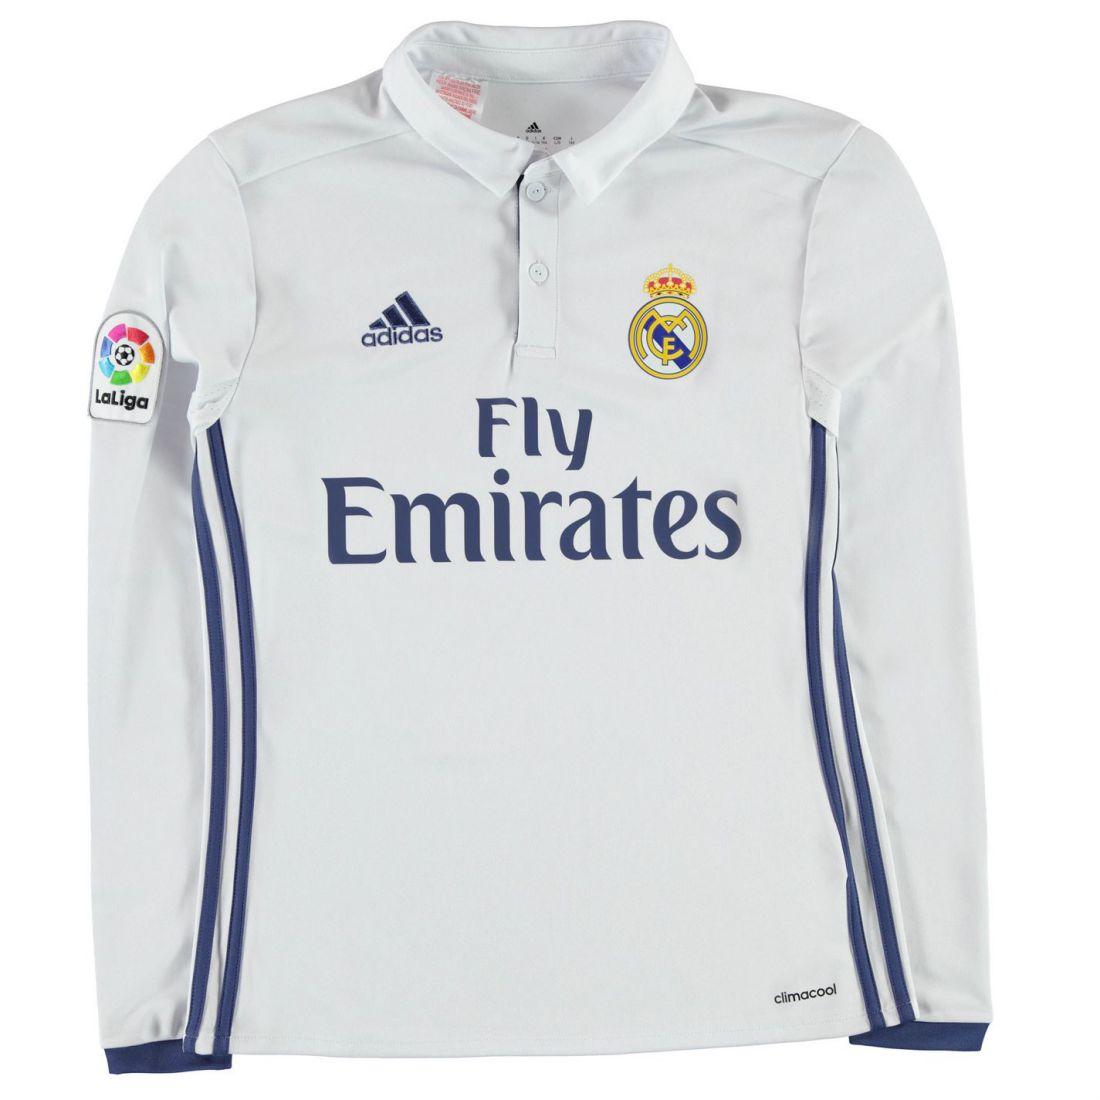 4f2b1b6cd adidas Kids Real Madrid Long Sleeve Shirt Juniors Top Button Placket ...